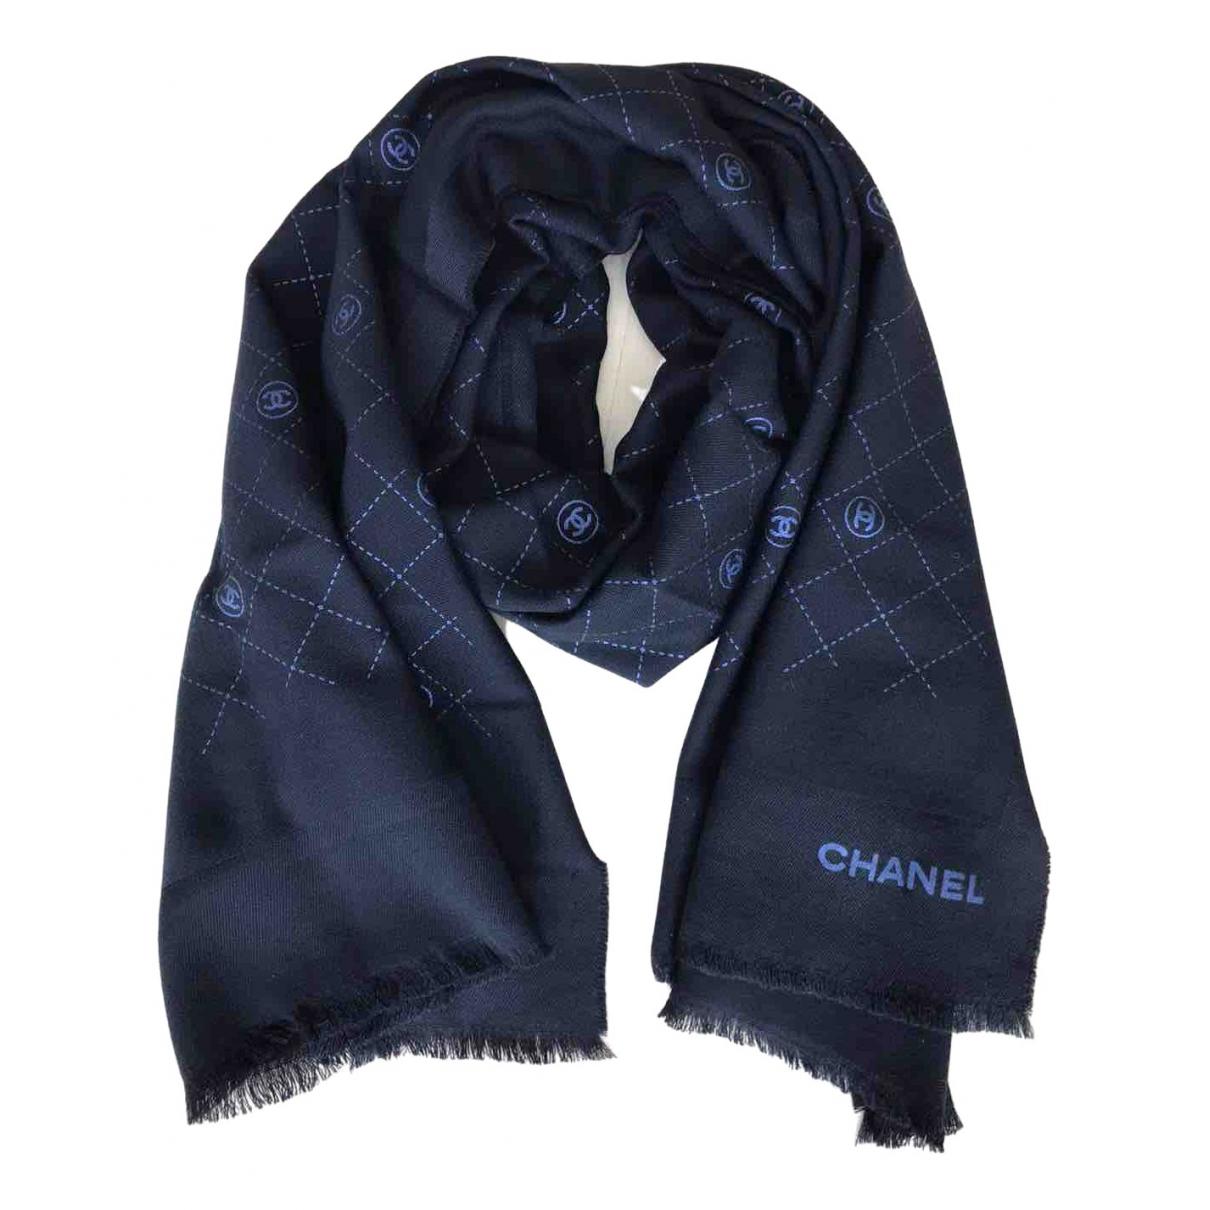 Chanel \N Black Wool scarf for Women \N